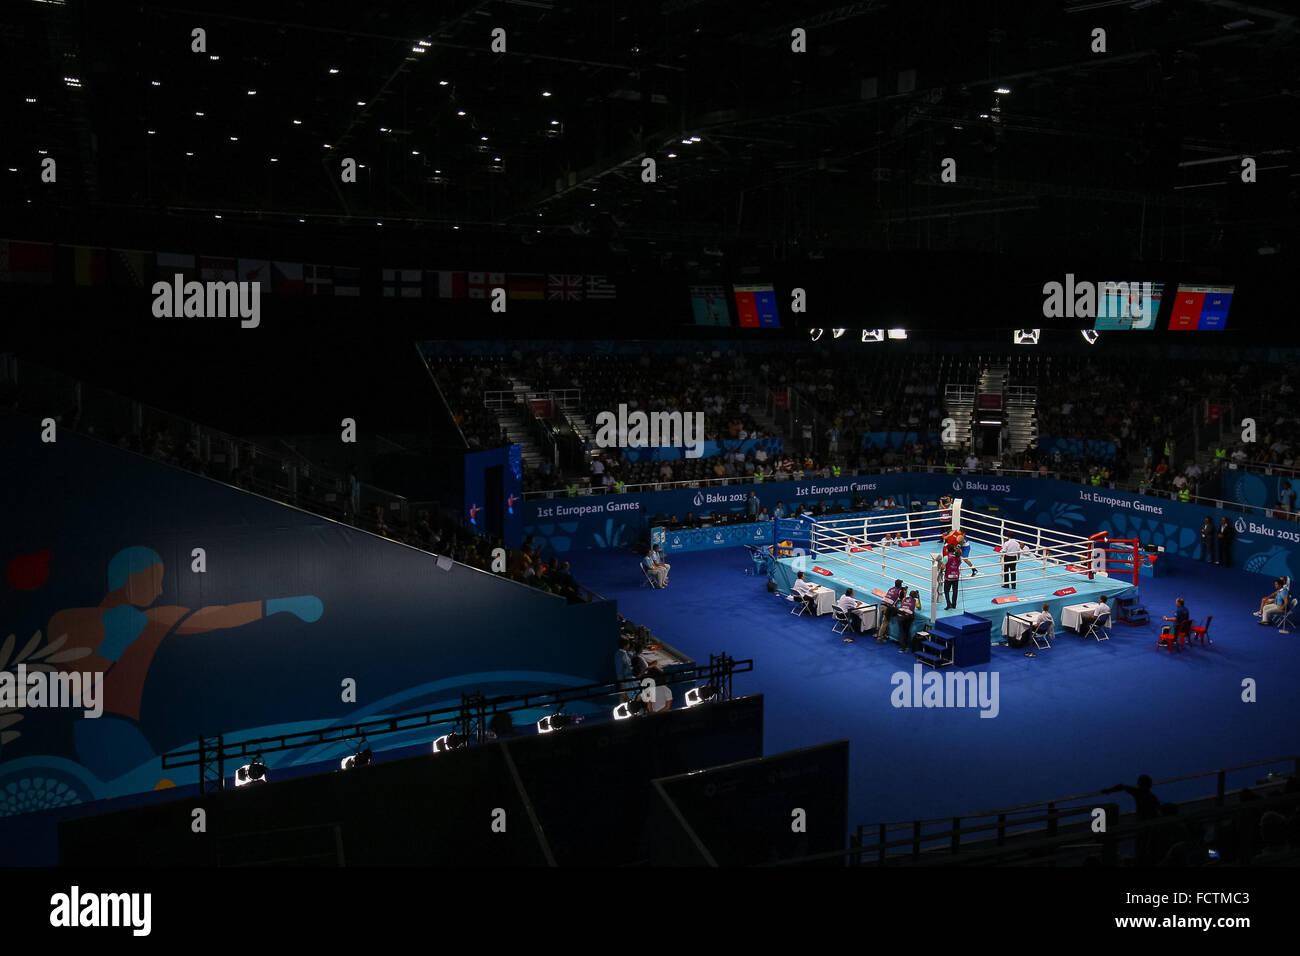 A general view of the boxing. Crystal Hall. Baku2015. 1st European Games. Baku. Azerbaijan. 22/06/2015 - Stock Image